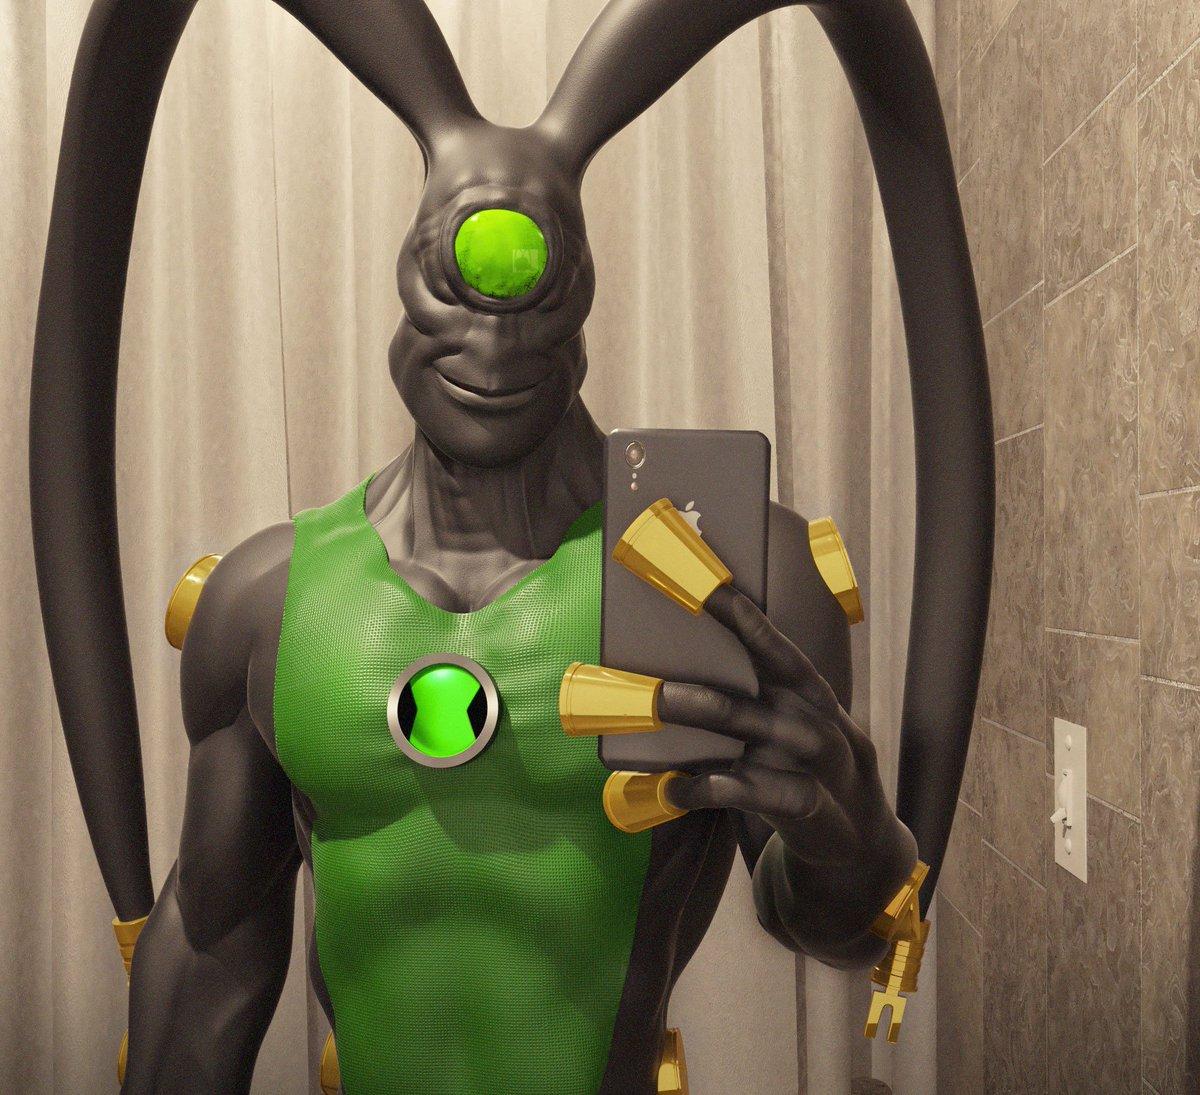 If Ben was a public figure on internet 😂 #feedback #ripjaws #xlr8  #wildmutt  #ghostfreak  #upgrade #heatblast #fourarms #Ben10 #Ben10aliens #fanart #zbrush #blender3d #avengers #conceptart #avengersendgame #spiderman #ironman #captainamerica #marvel #marvelstudios